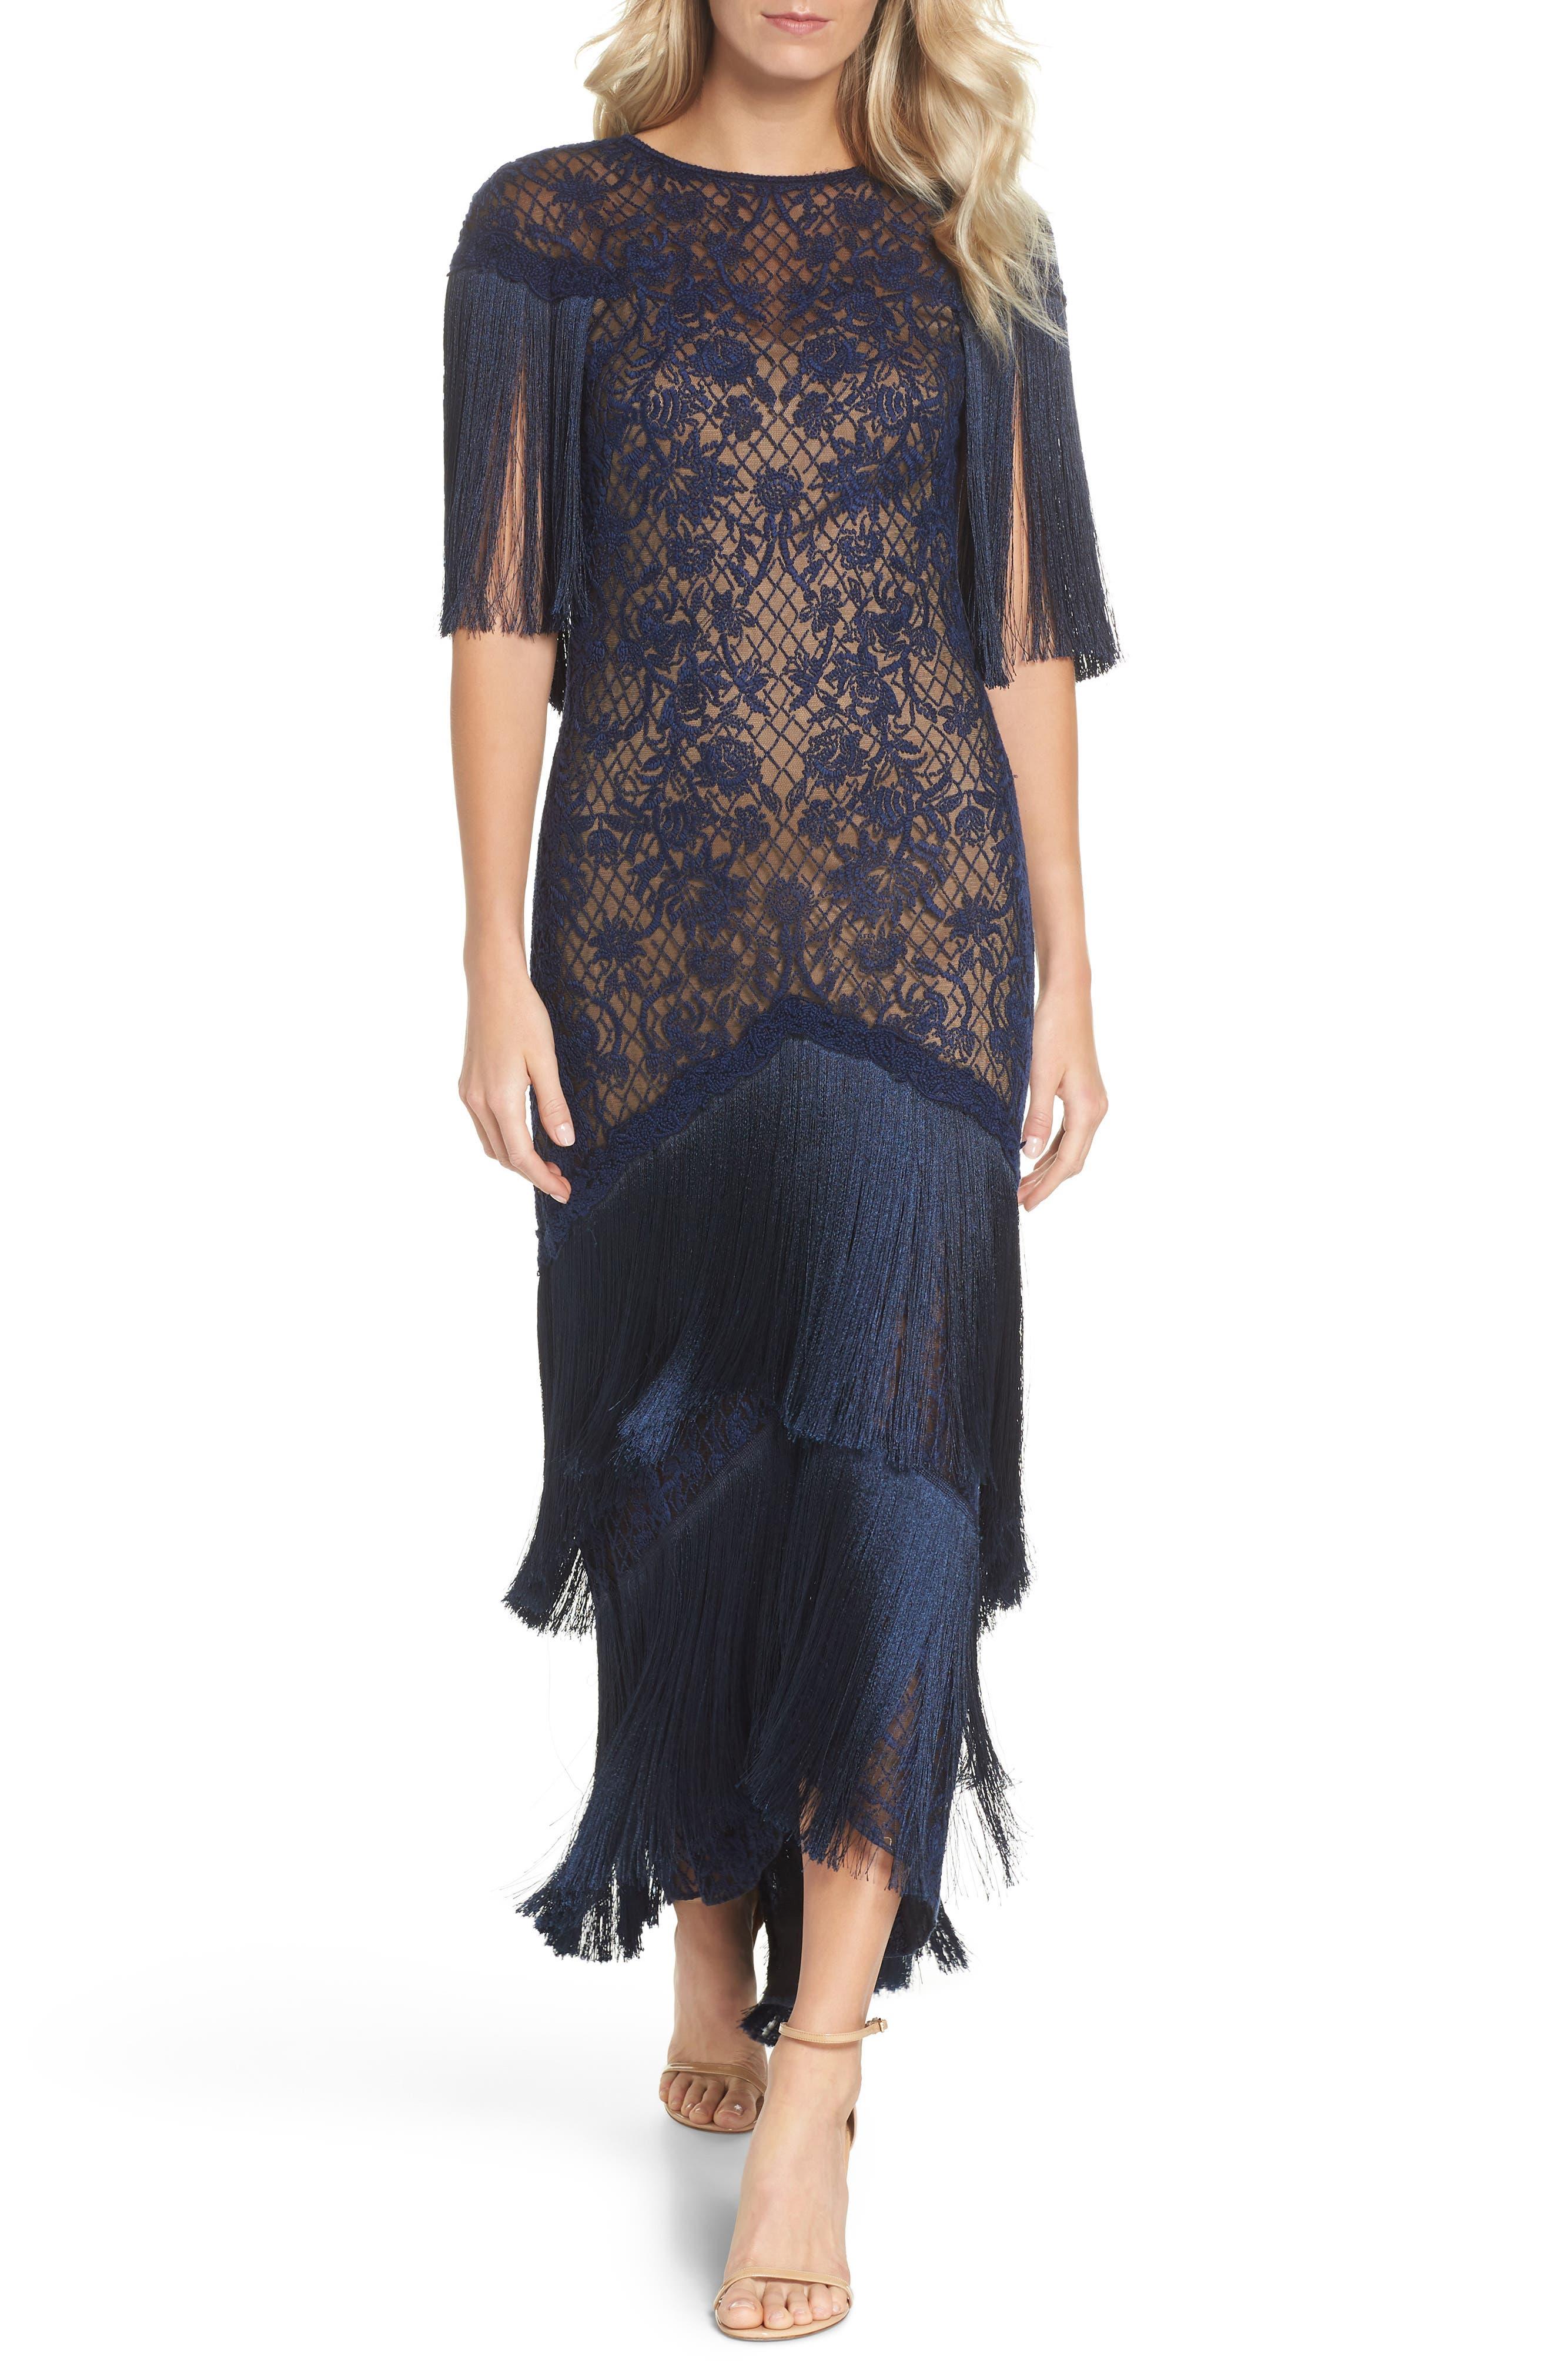 70s Prom, Formal, Evening, Party Dresses Womens Tadashi Shoji Embroidered Mesh  Fringe Gown Size 12 - Blue $628.00 AT vintagedancer.com